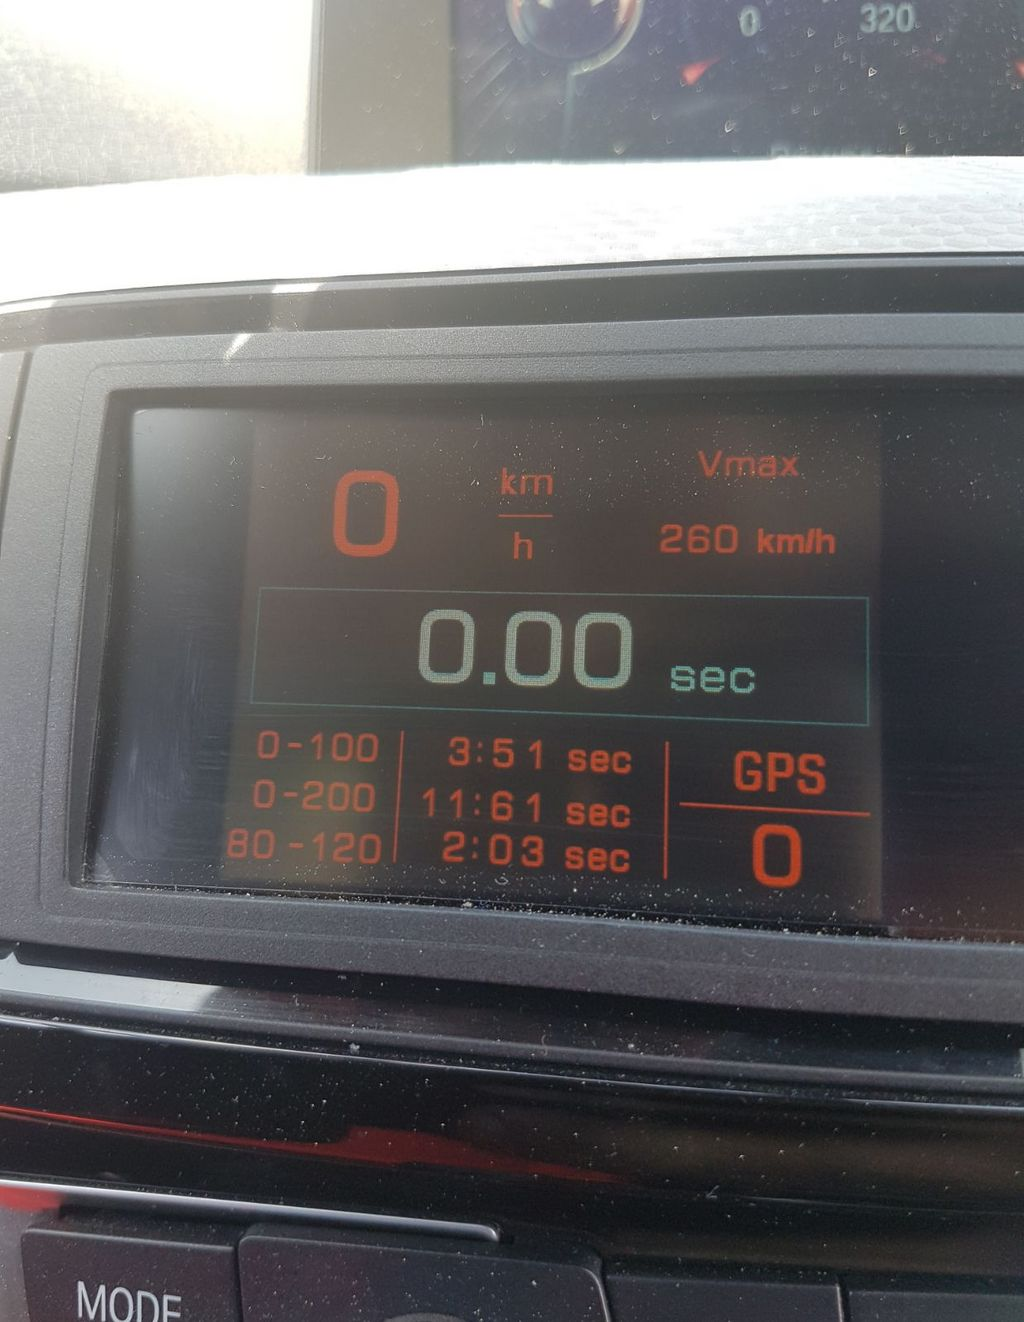 BMW 335d VBOX Graph